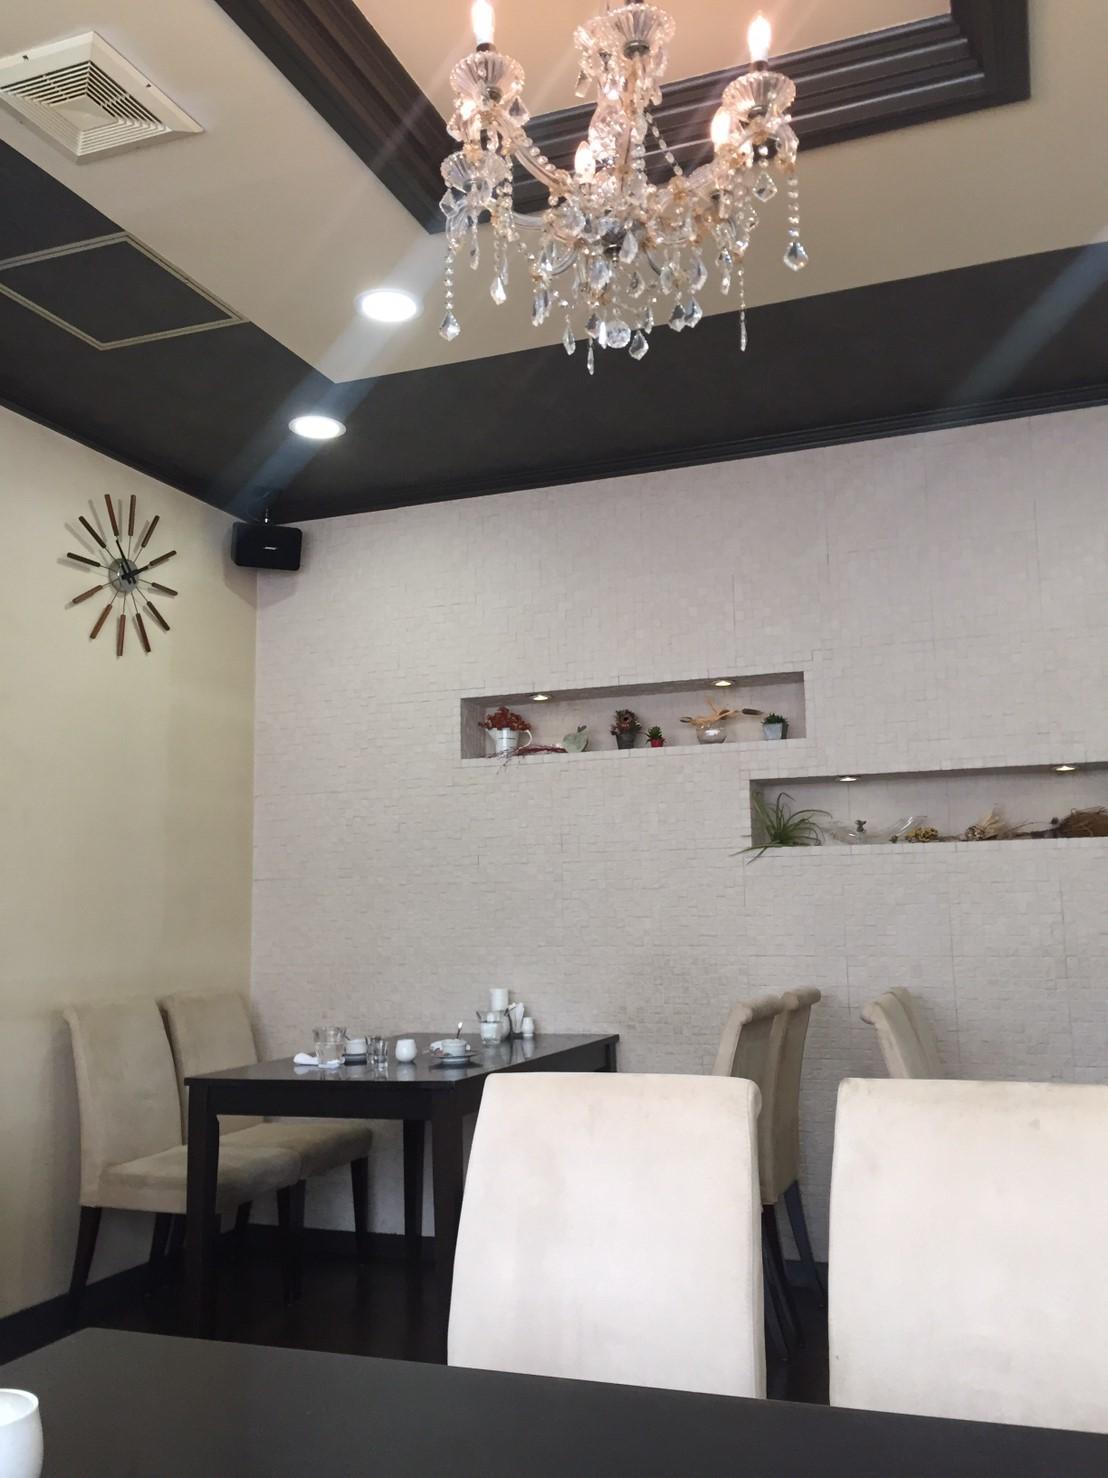 cafe & restaurant Andrews  日替わり  ジャンボ有頭海老フライ_e0115904_00362491.jpg